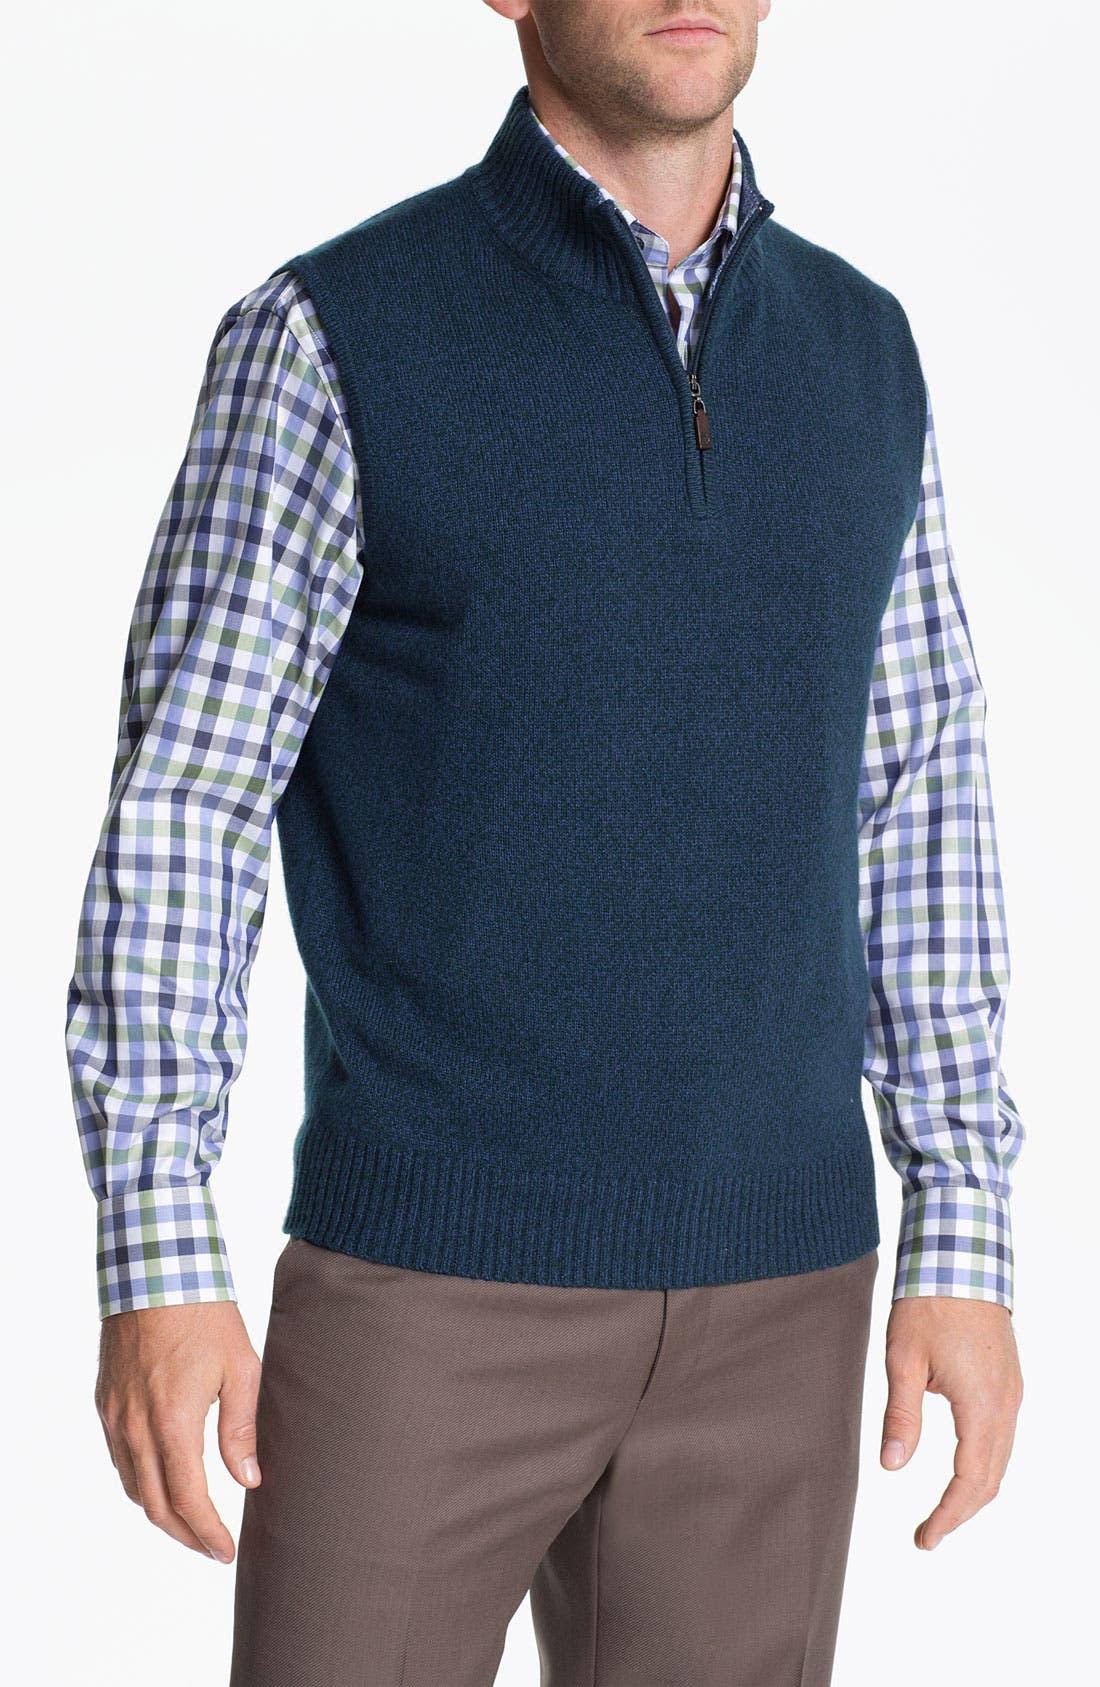 Main Image - Robert Talbott Wool & Cashmere Blend Sweater Vest